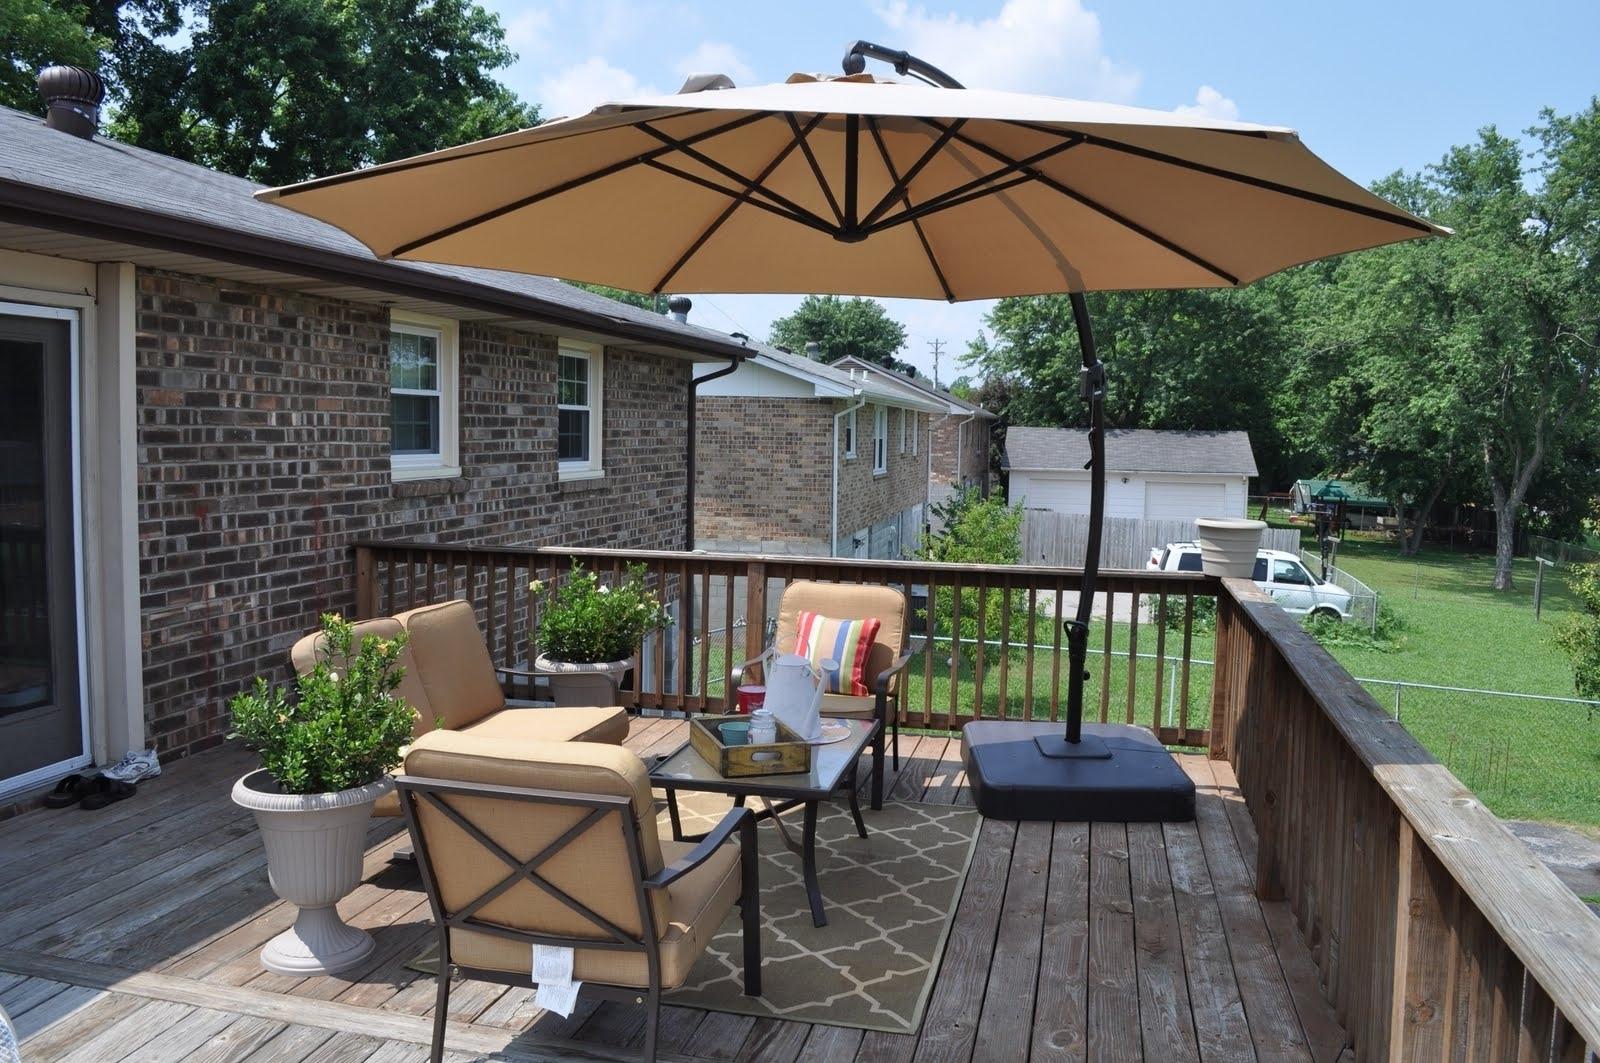 Garden: Enchanting Outdoor Patio Decor Ideas With Patio Umbrellas Within Fashionable Patio Deck Umbrellas (View 4 of 20)